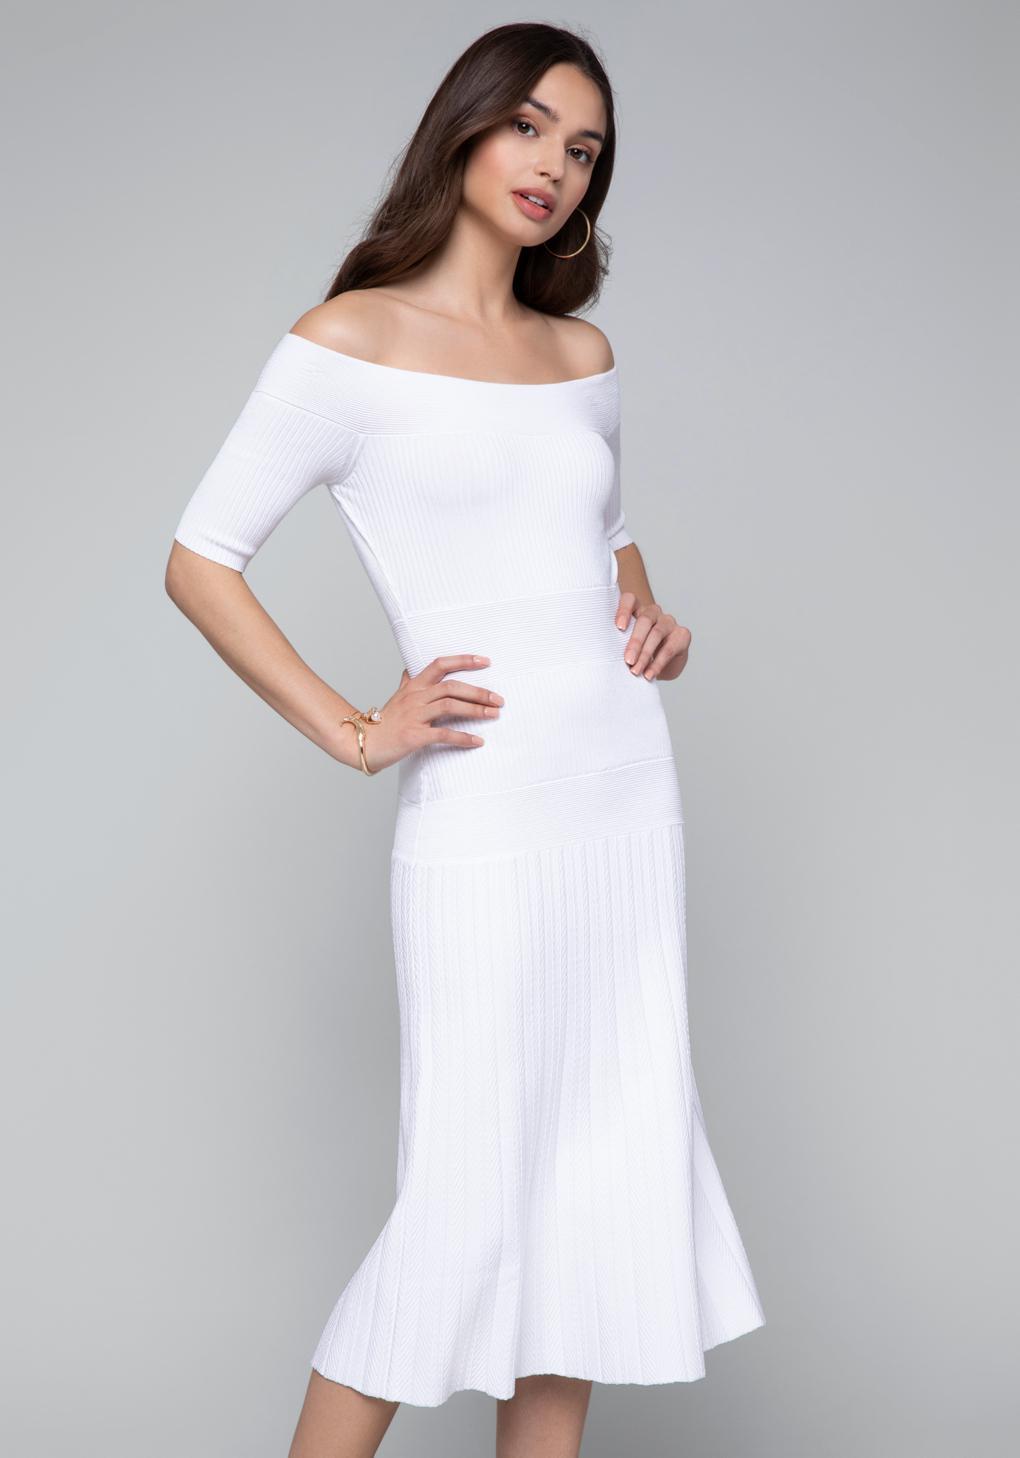 0bbc915ab8f7 Lyst - Bebe Tatiana Dress in White